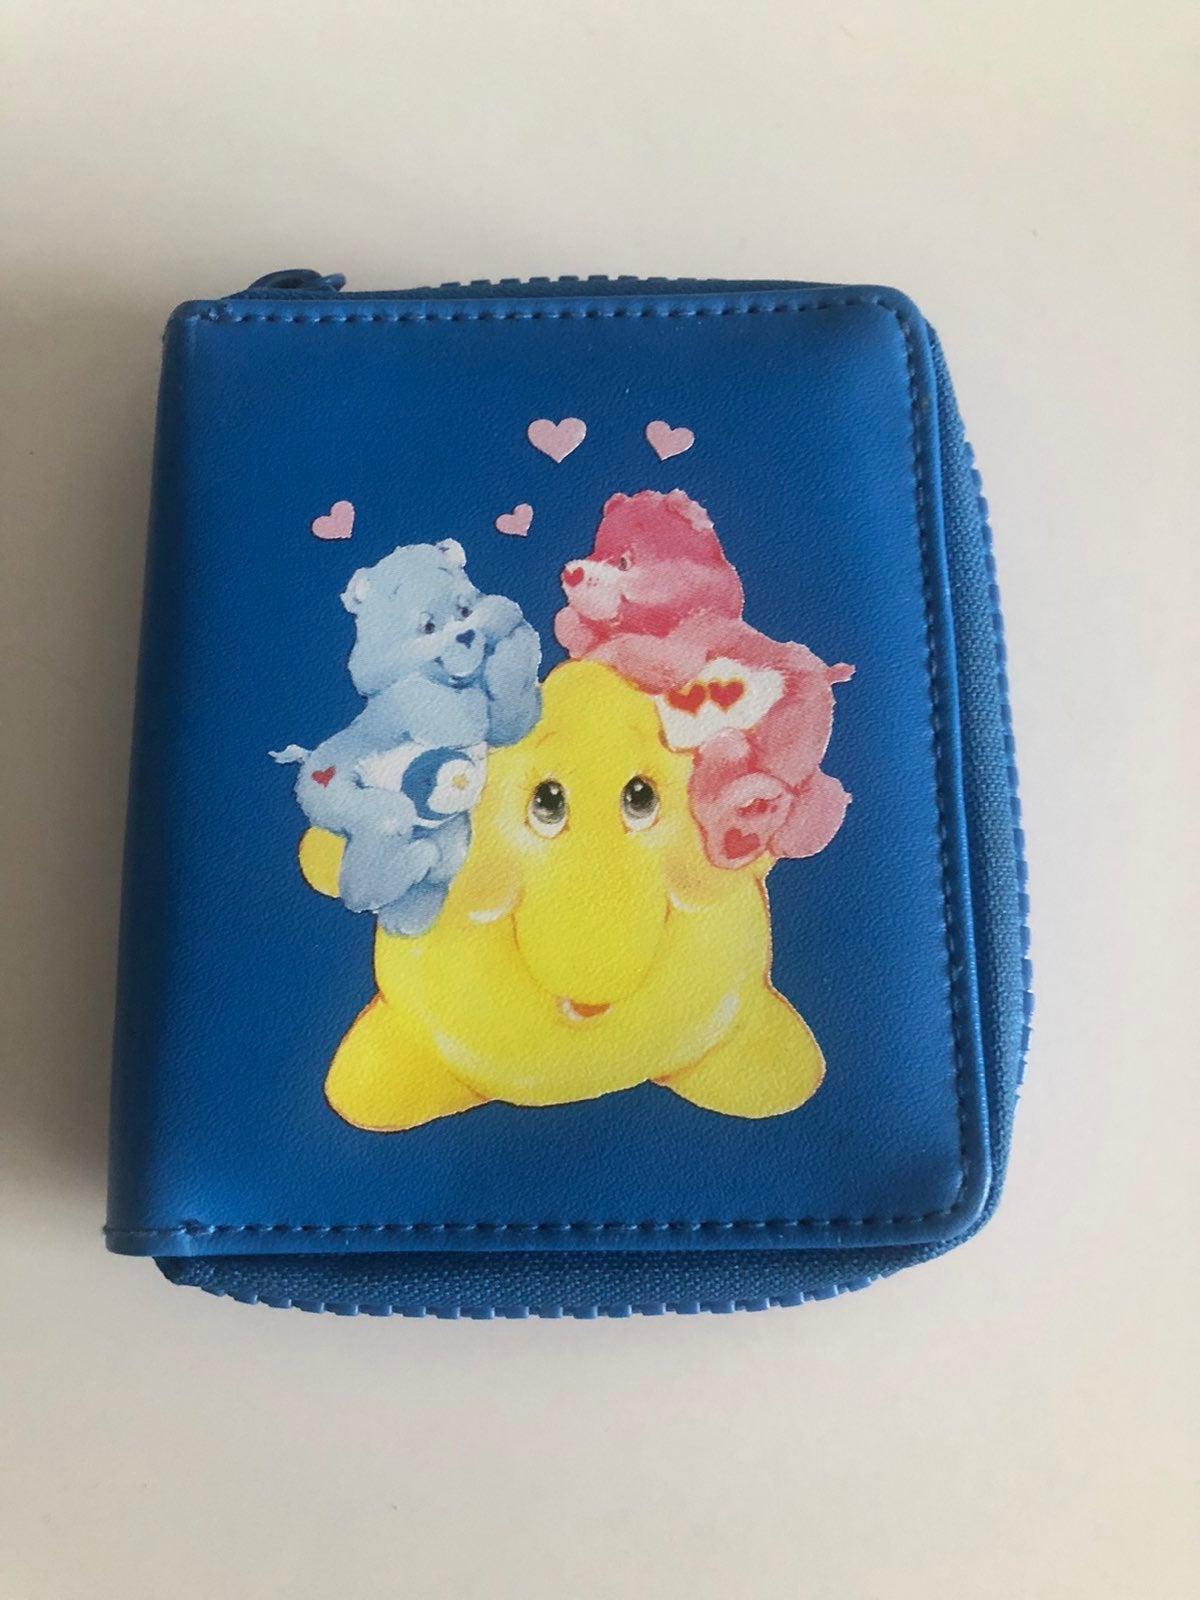 Vintage Care Bears Wallet, 2003